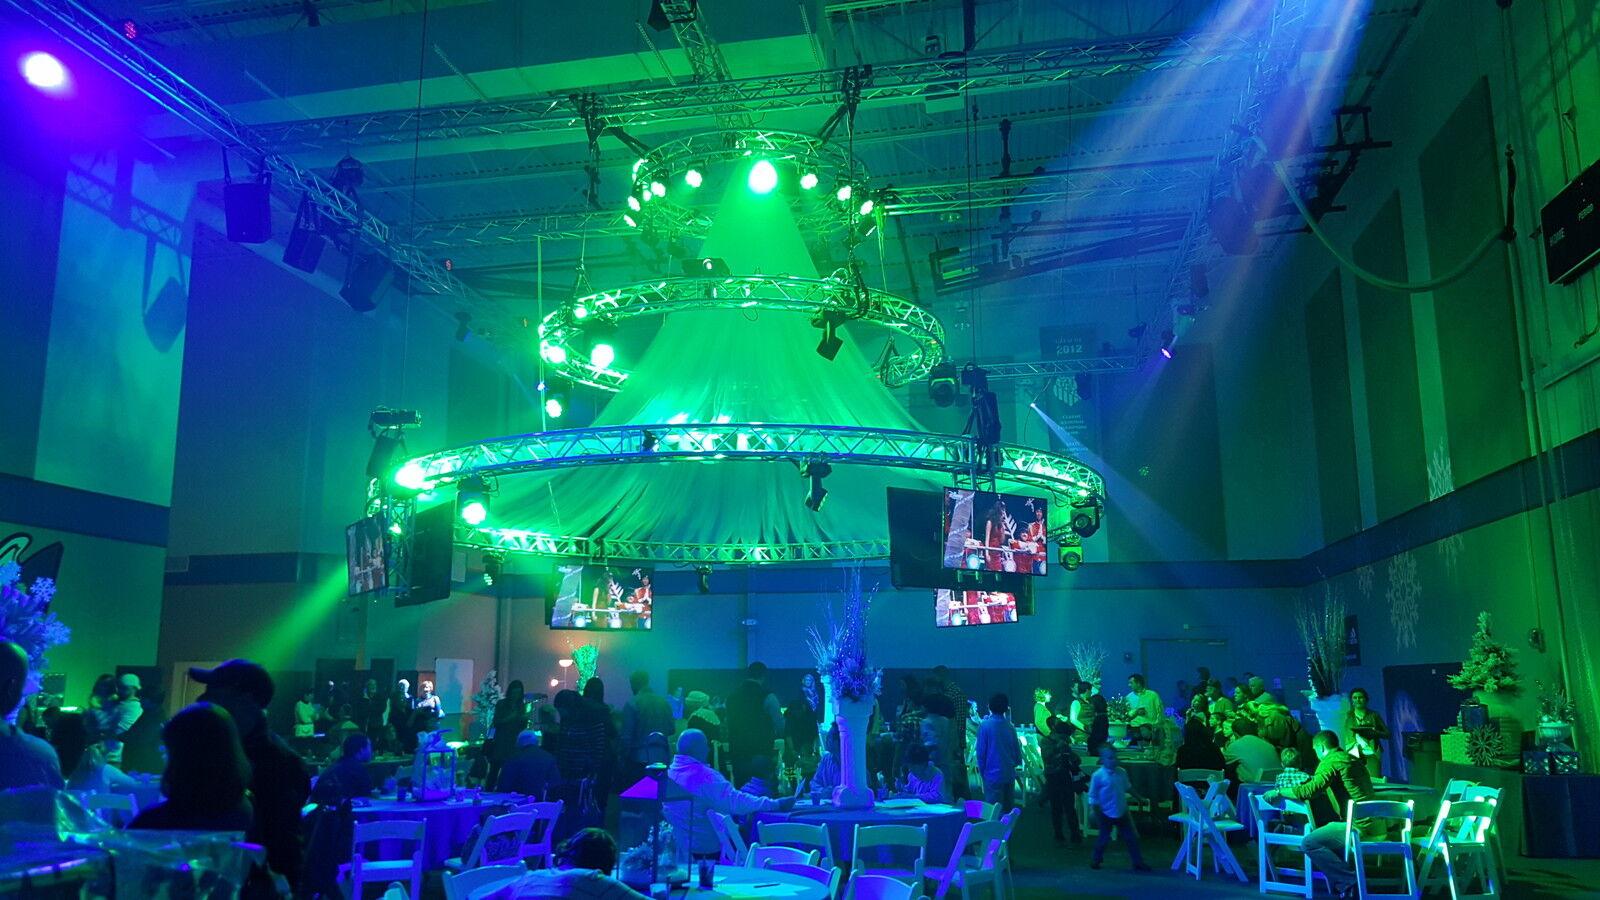 Cincy Lighting Services